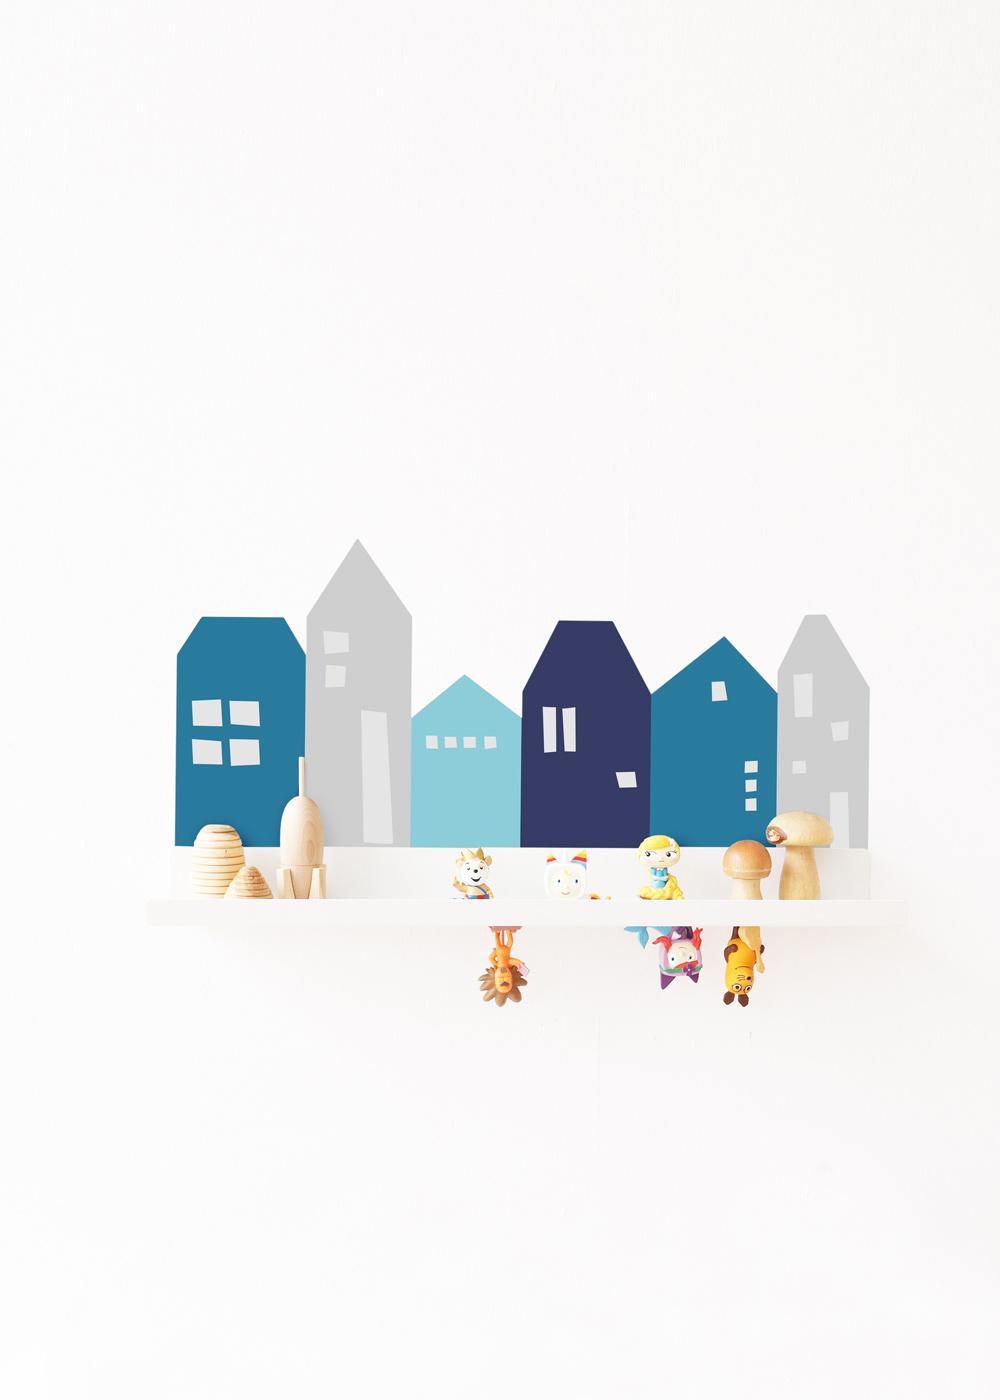 Ikea Malmbäck Bilderleiste Lille Hus hellgrau Gesamtansicht